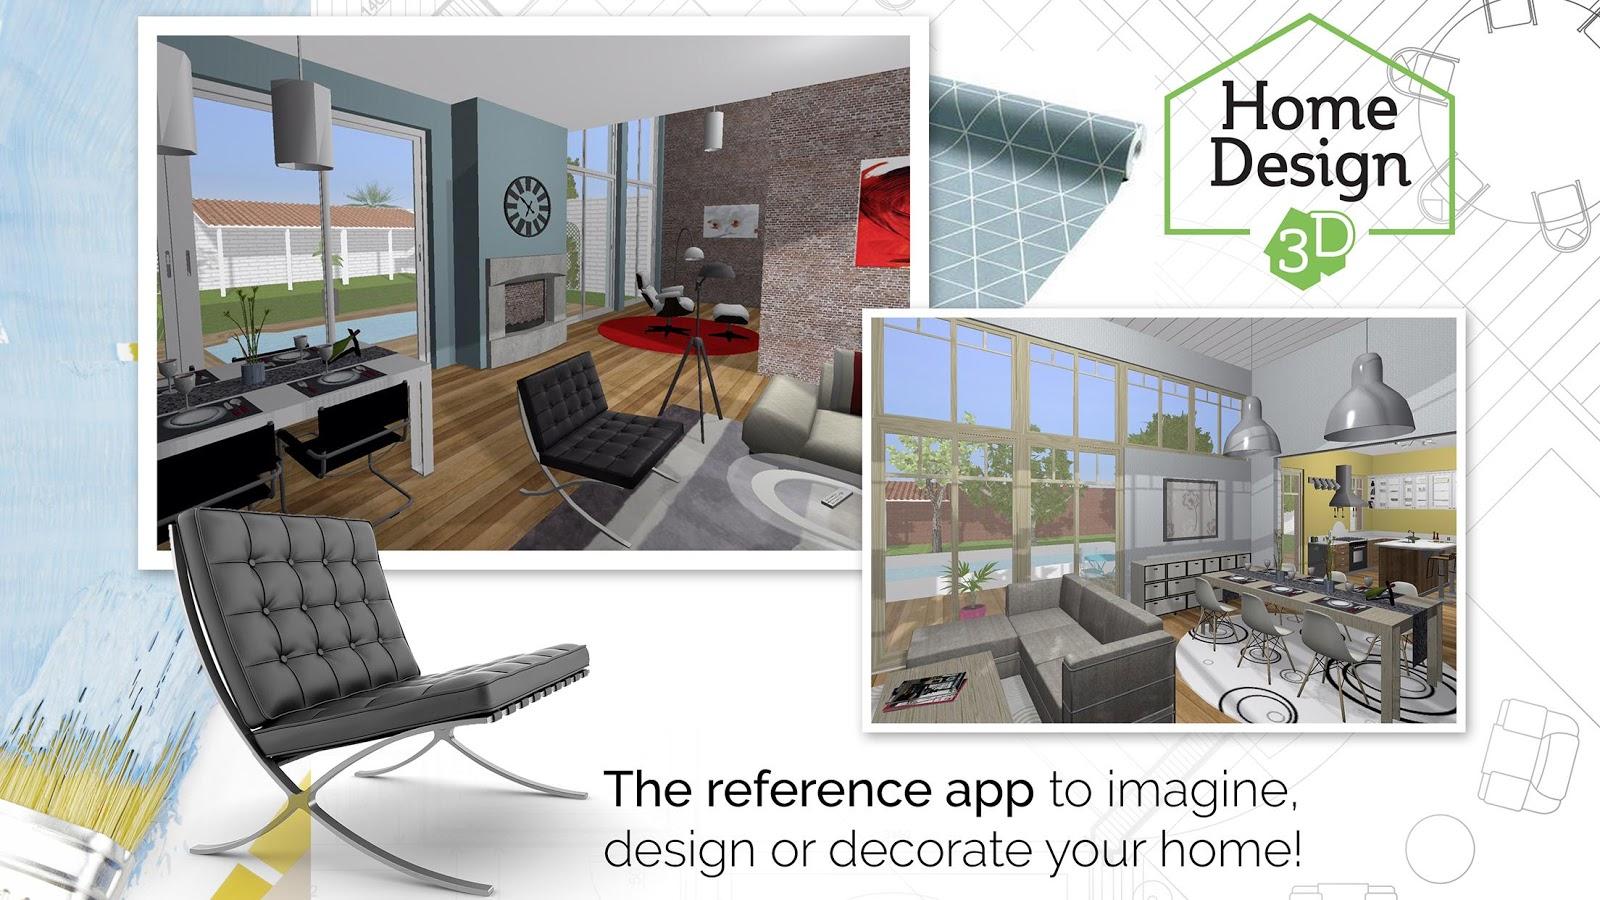 home design 3d freemium 412 screenshot 6